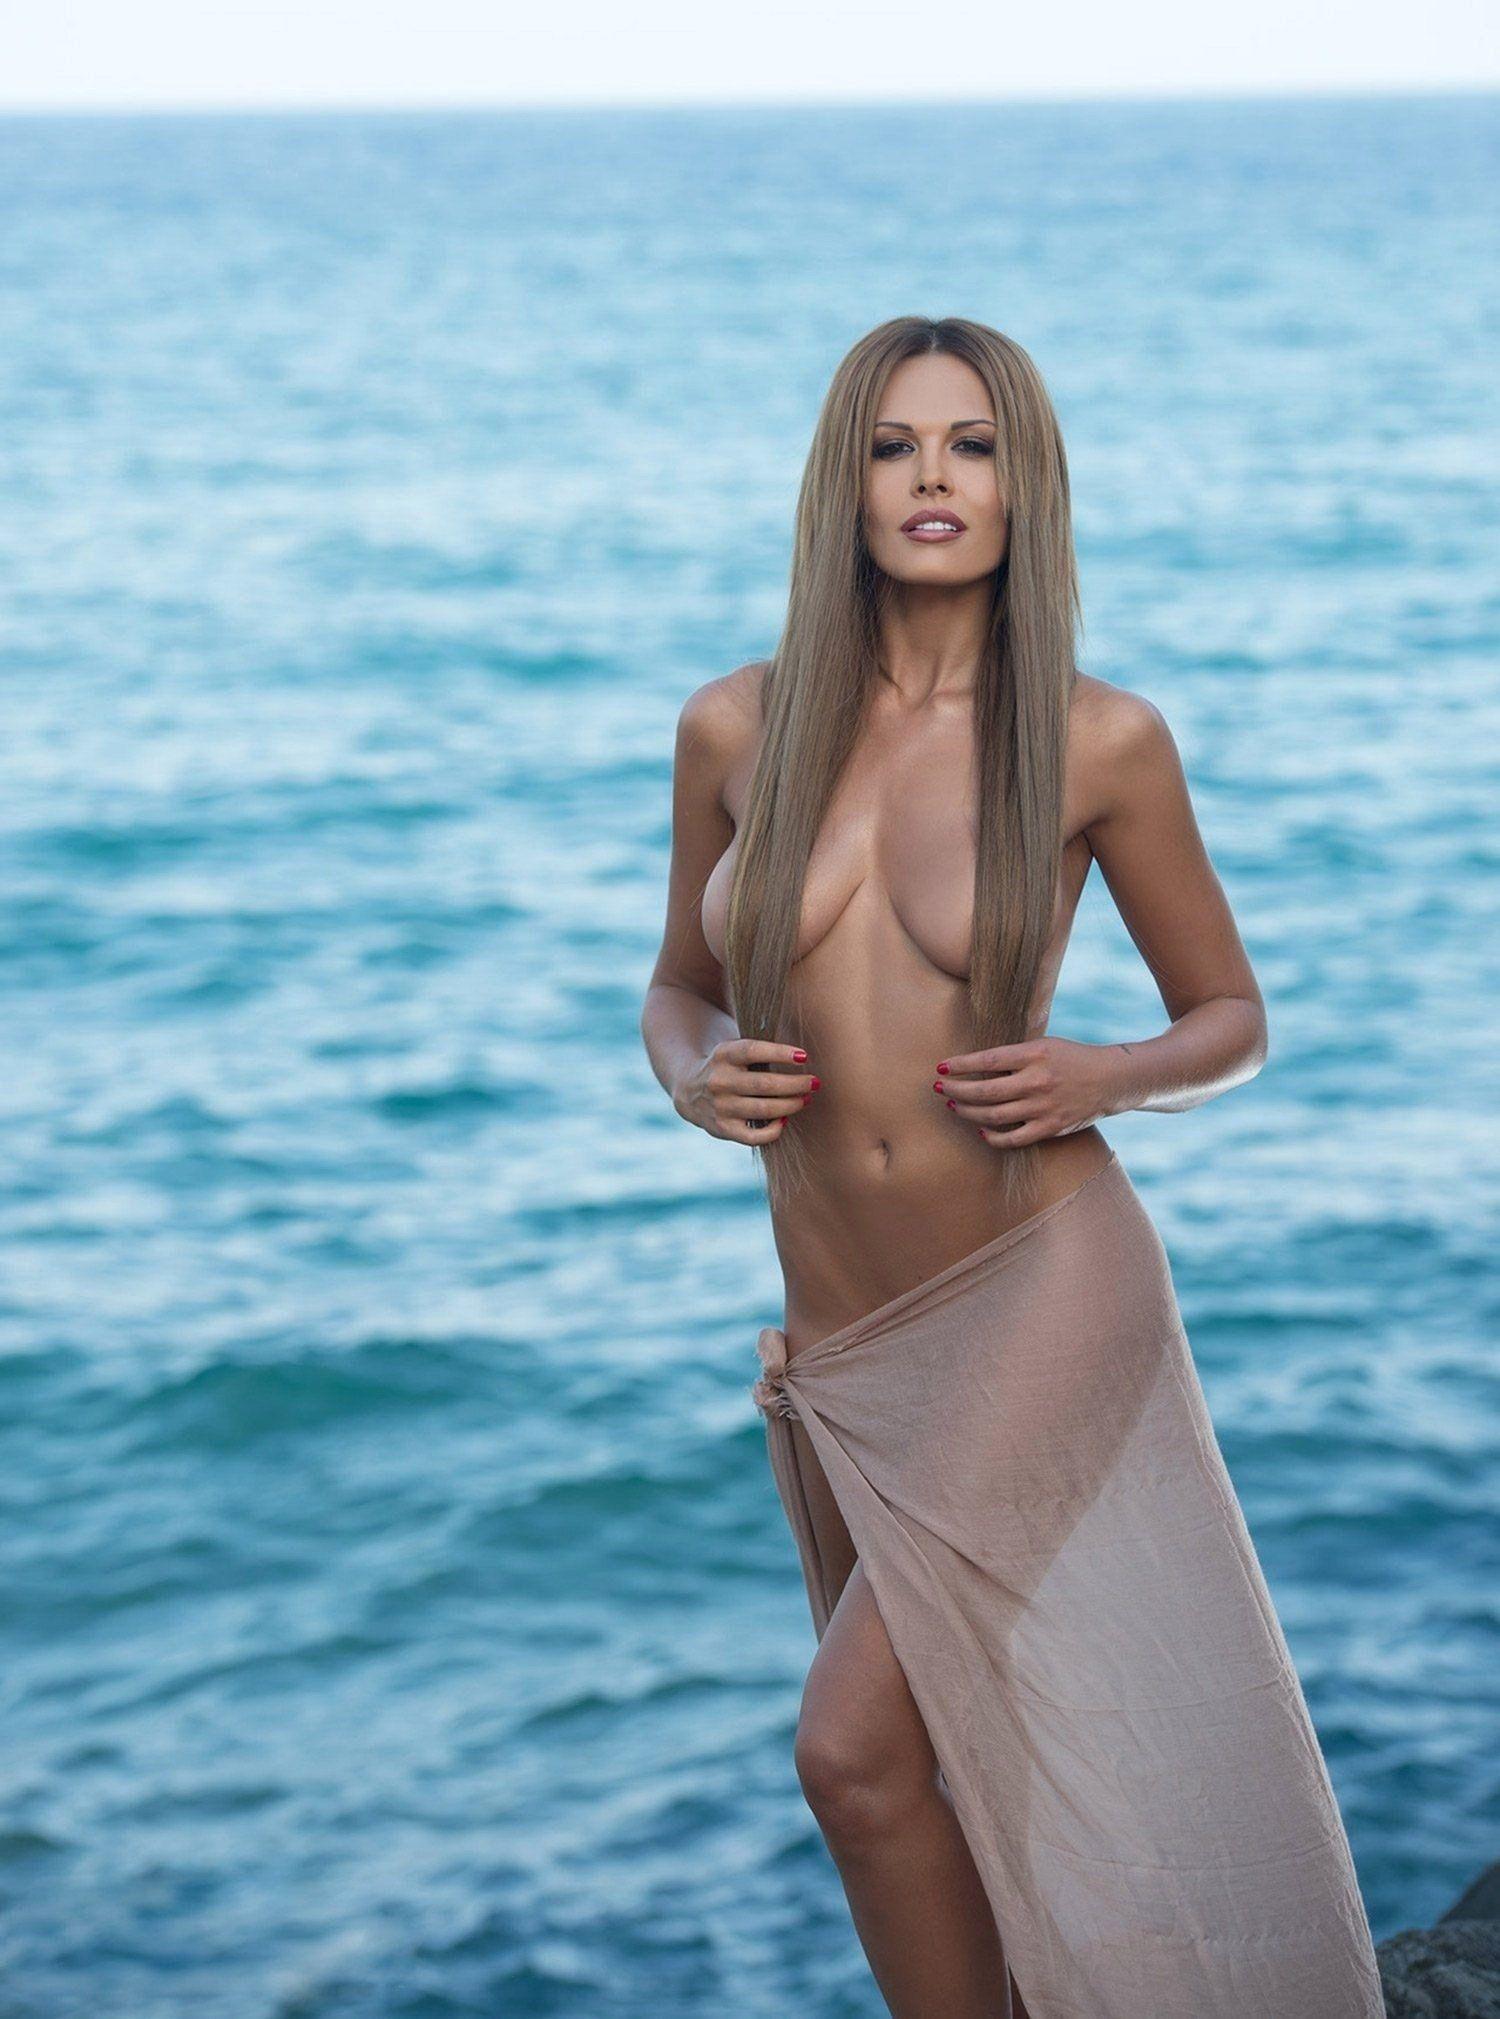 Topless girl on beach australia